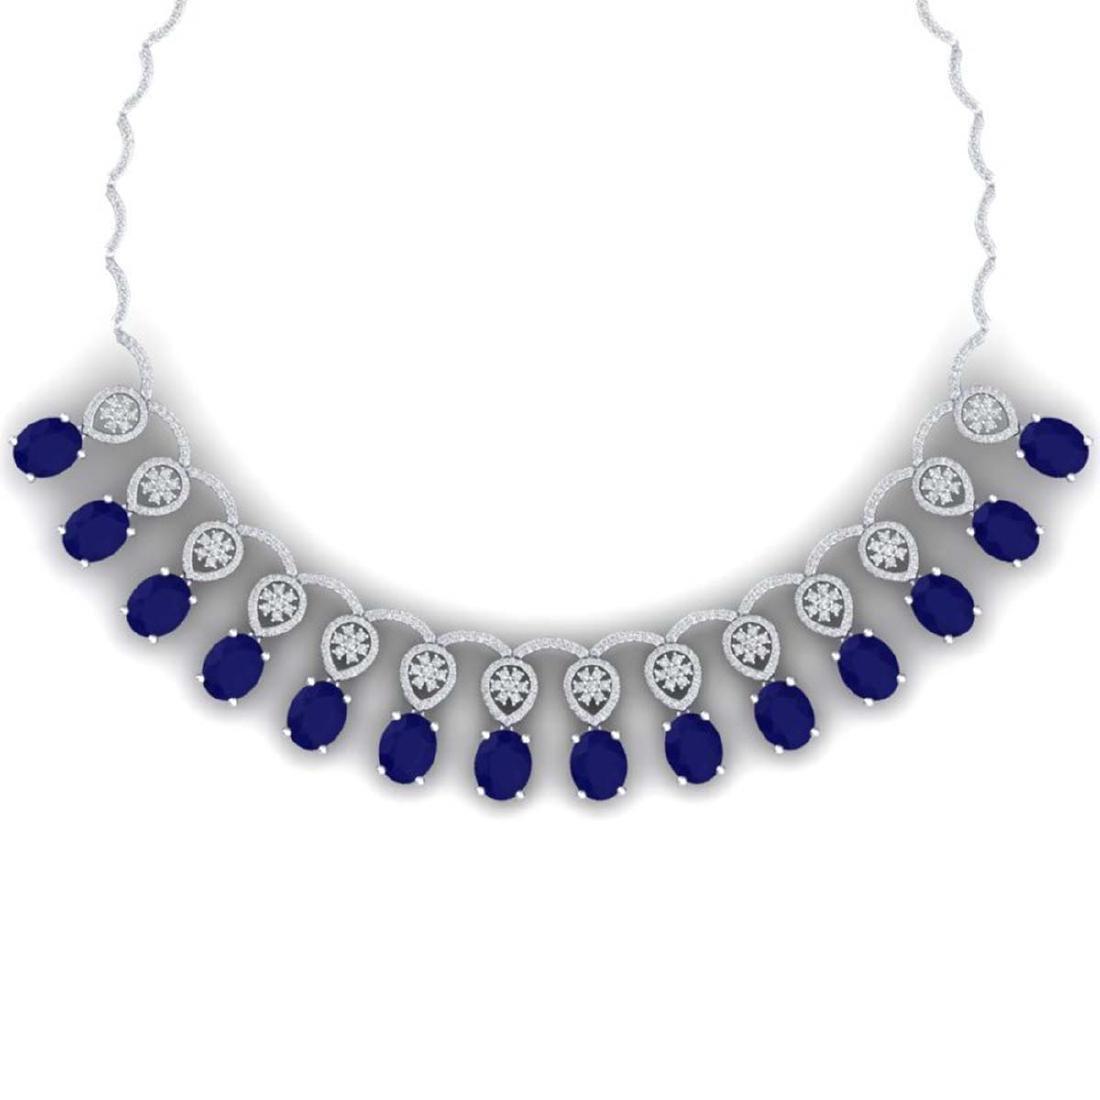 54.05 ctw Sapphire & VS Diamond Necklace 18K White Gold